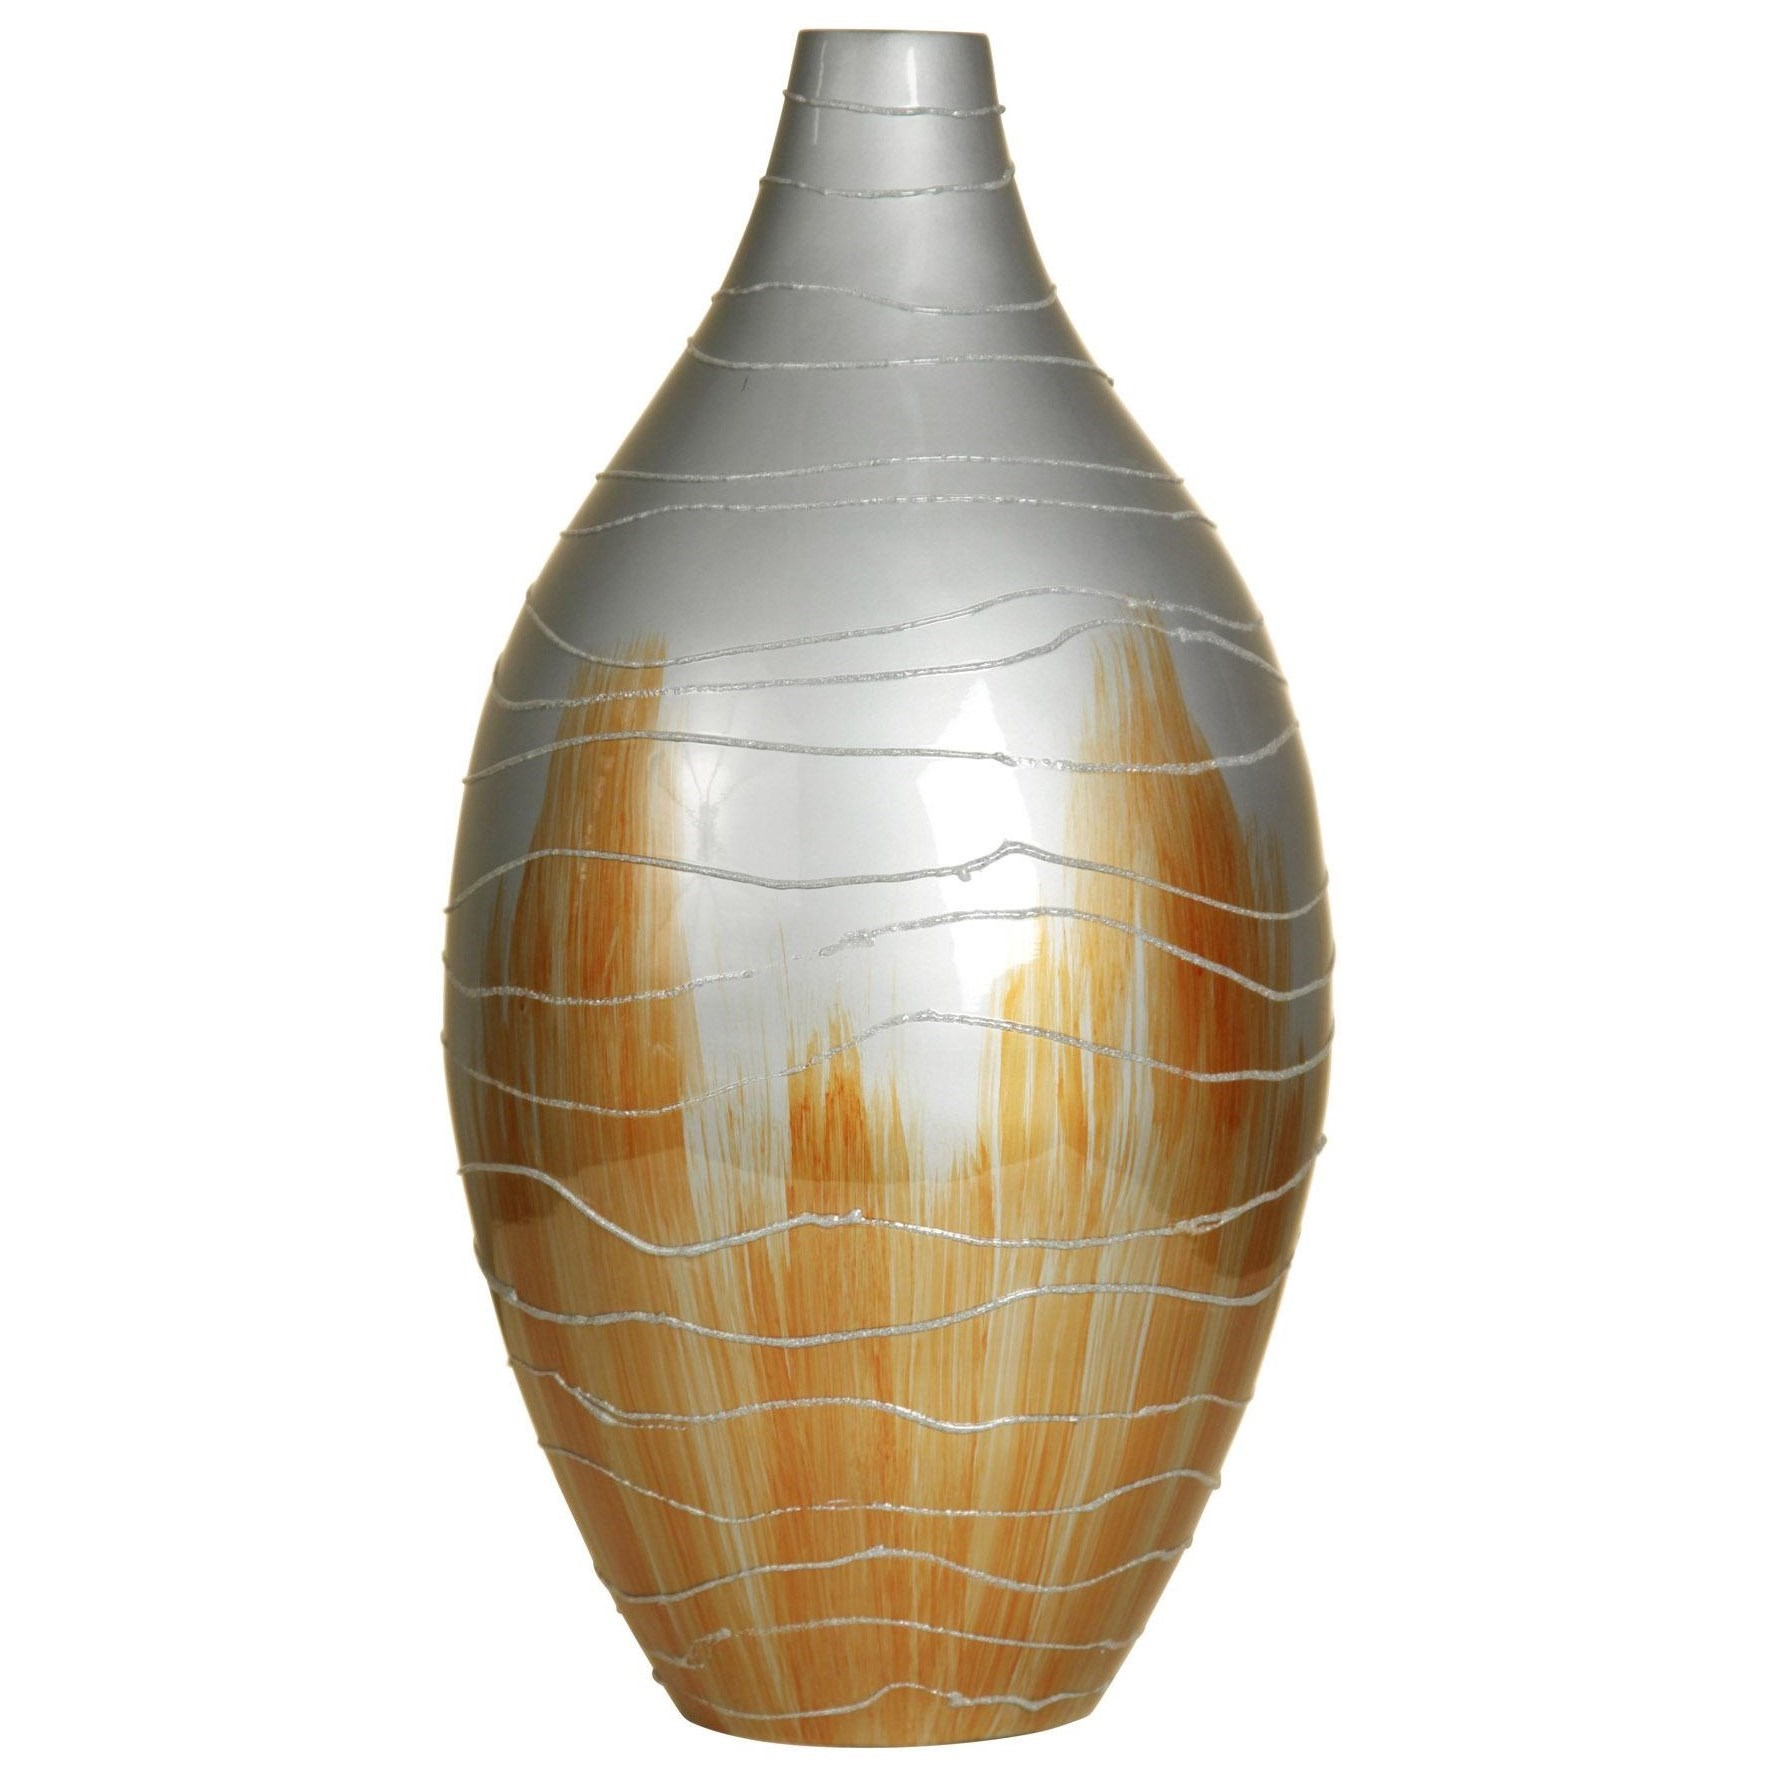 Accessories Corner Vase by StyleCraft at Alison Craig Home Furnishings